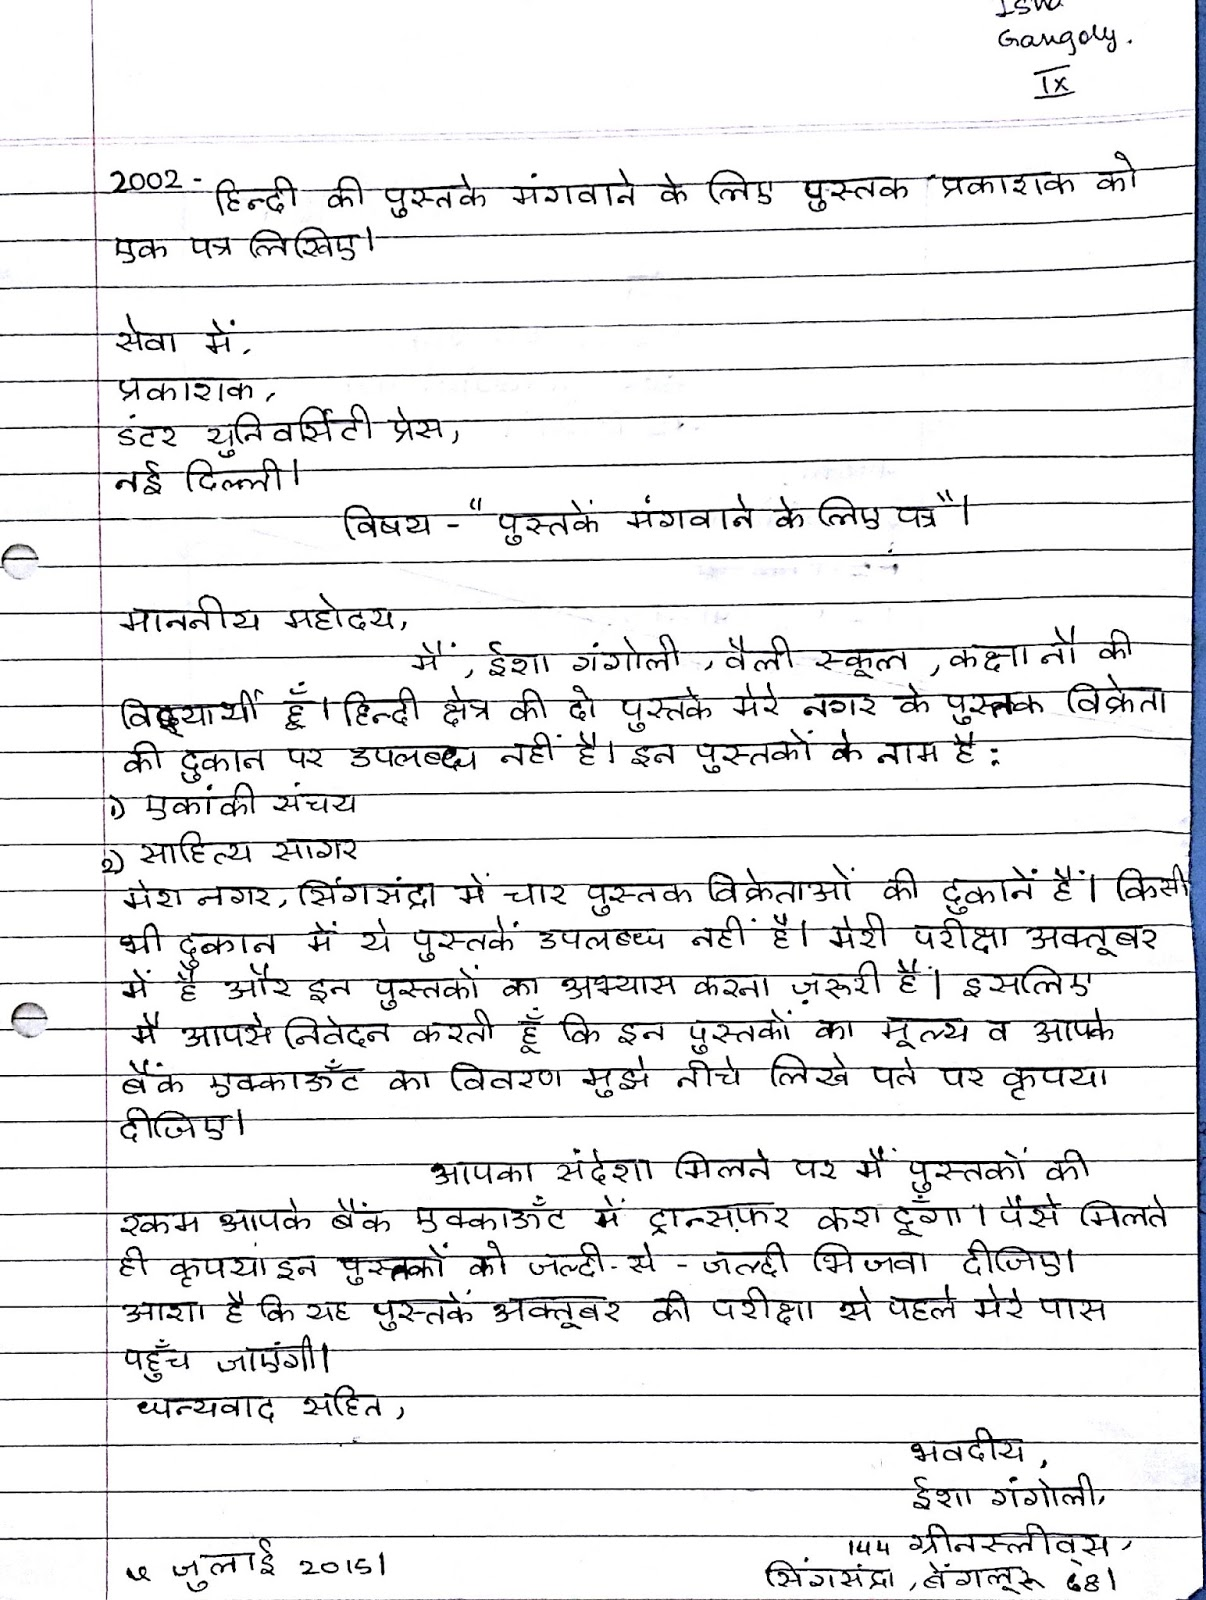 Bachon Ki Kalam Se Letter To Book Publisher About Sending